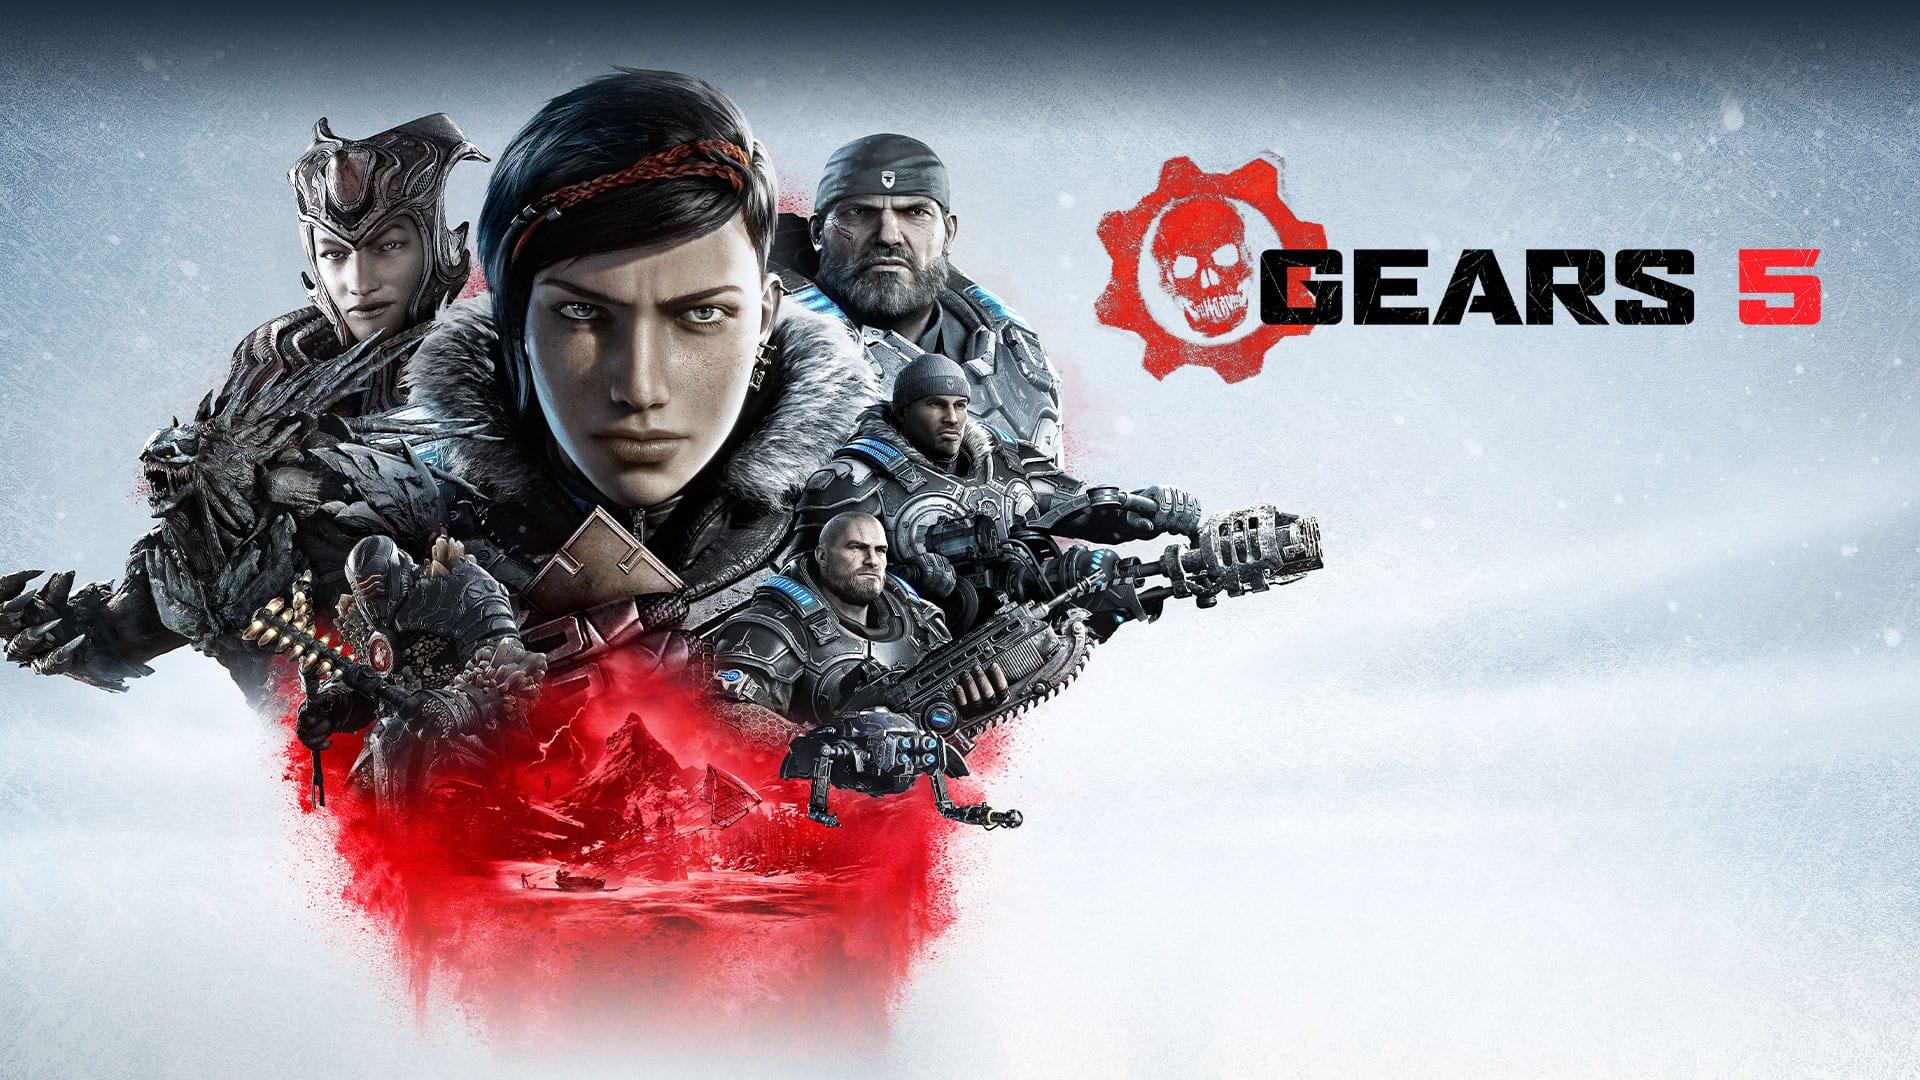 Gears of War 5, skiff